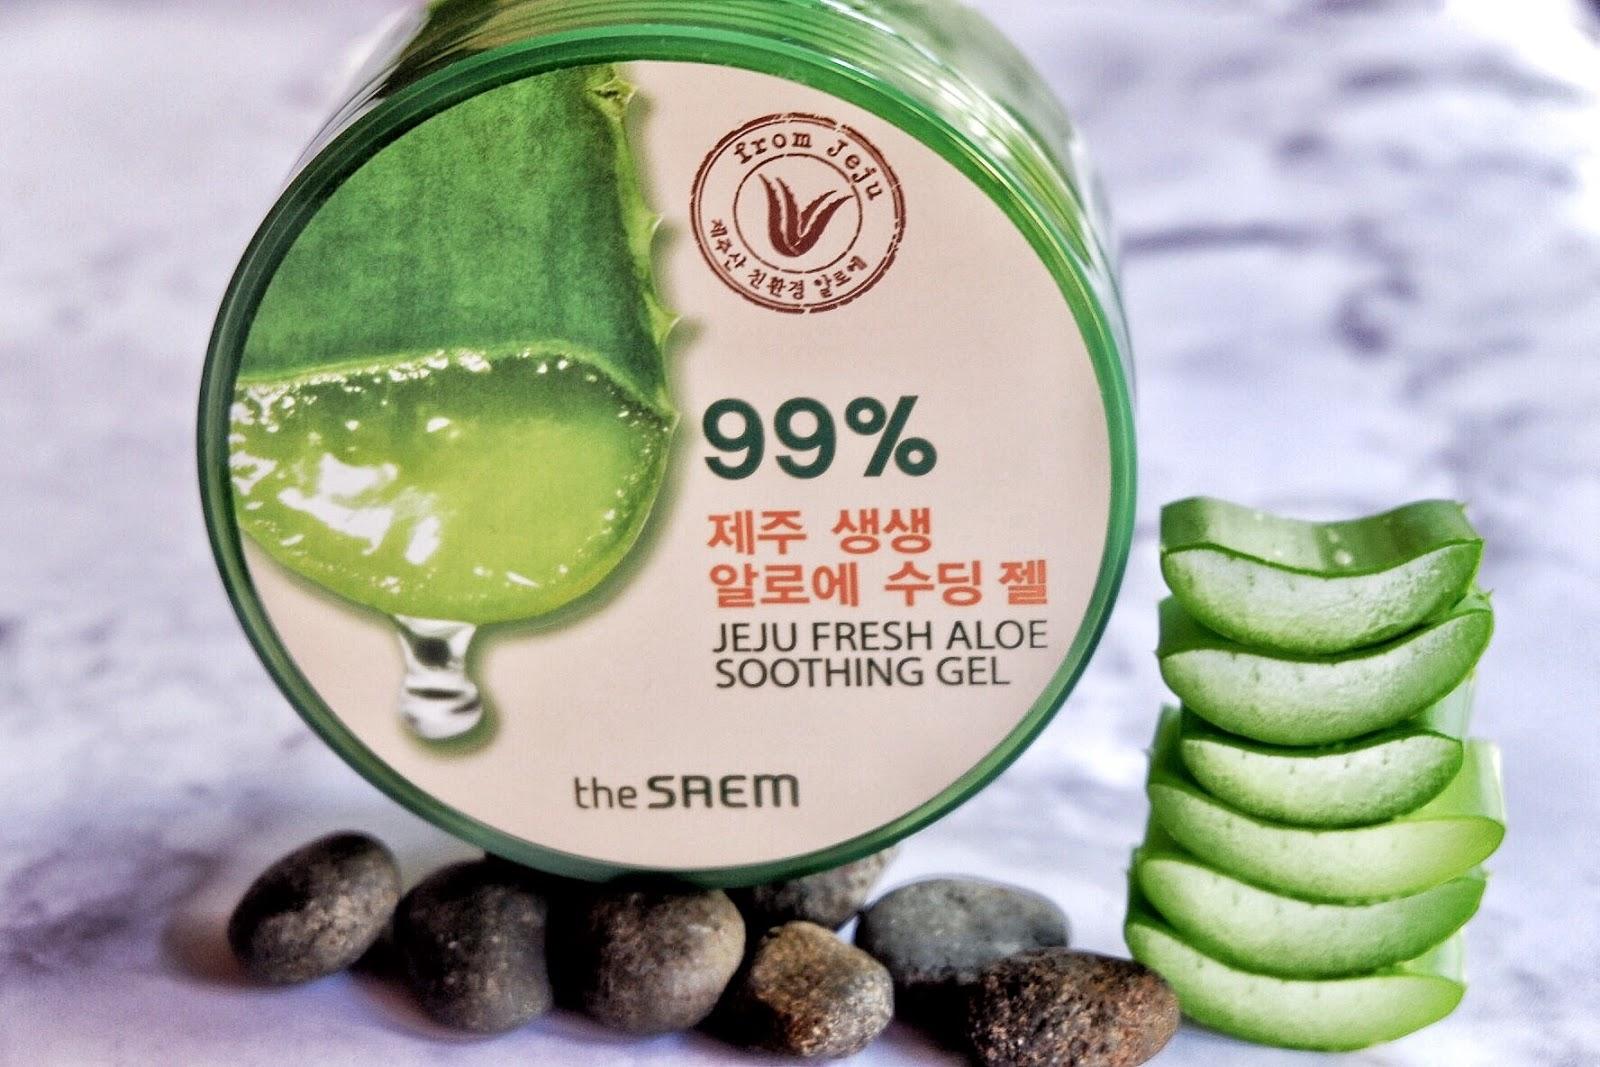 Review The Saem Jeju Fresh Aloe Soothing Gel 99 Shooting